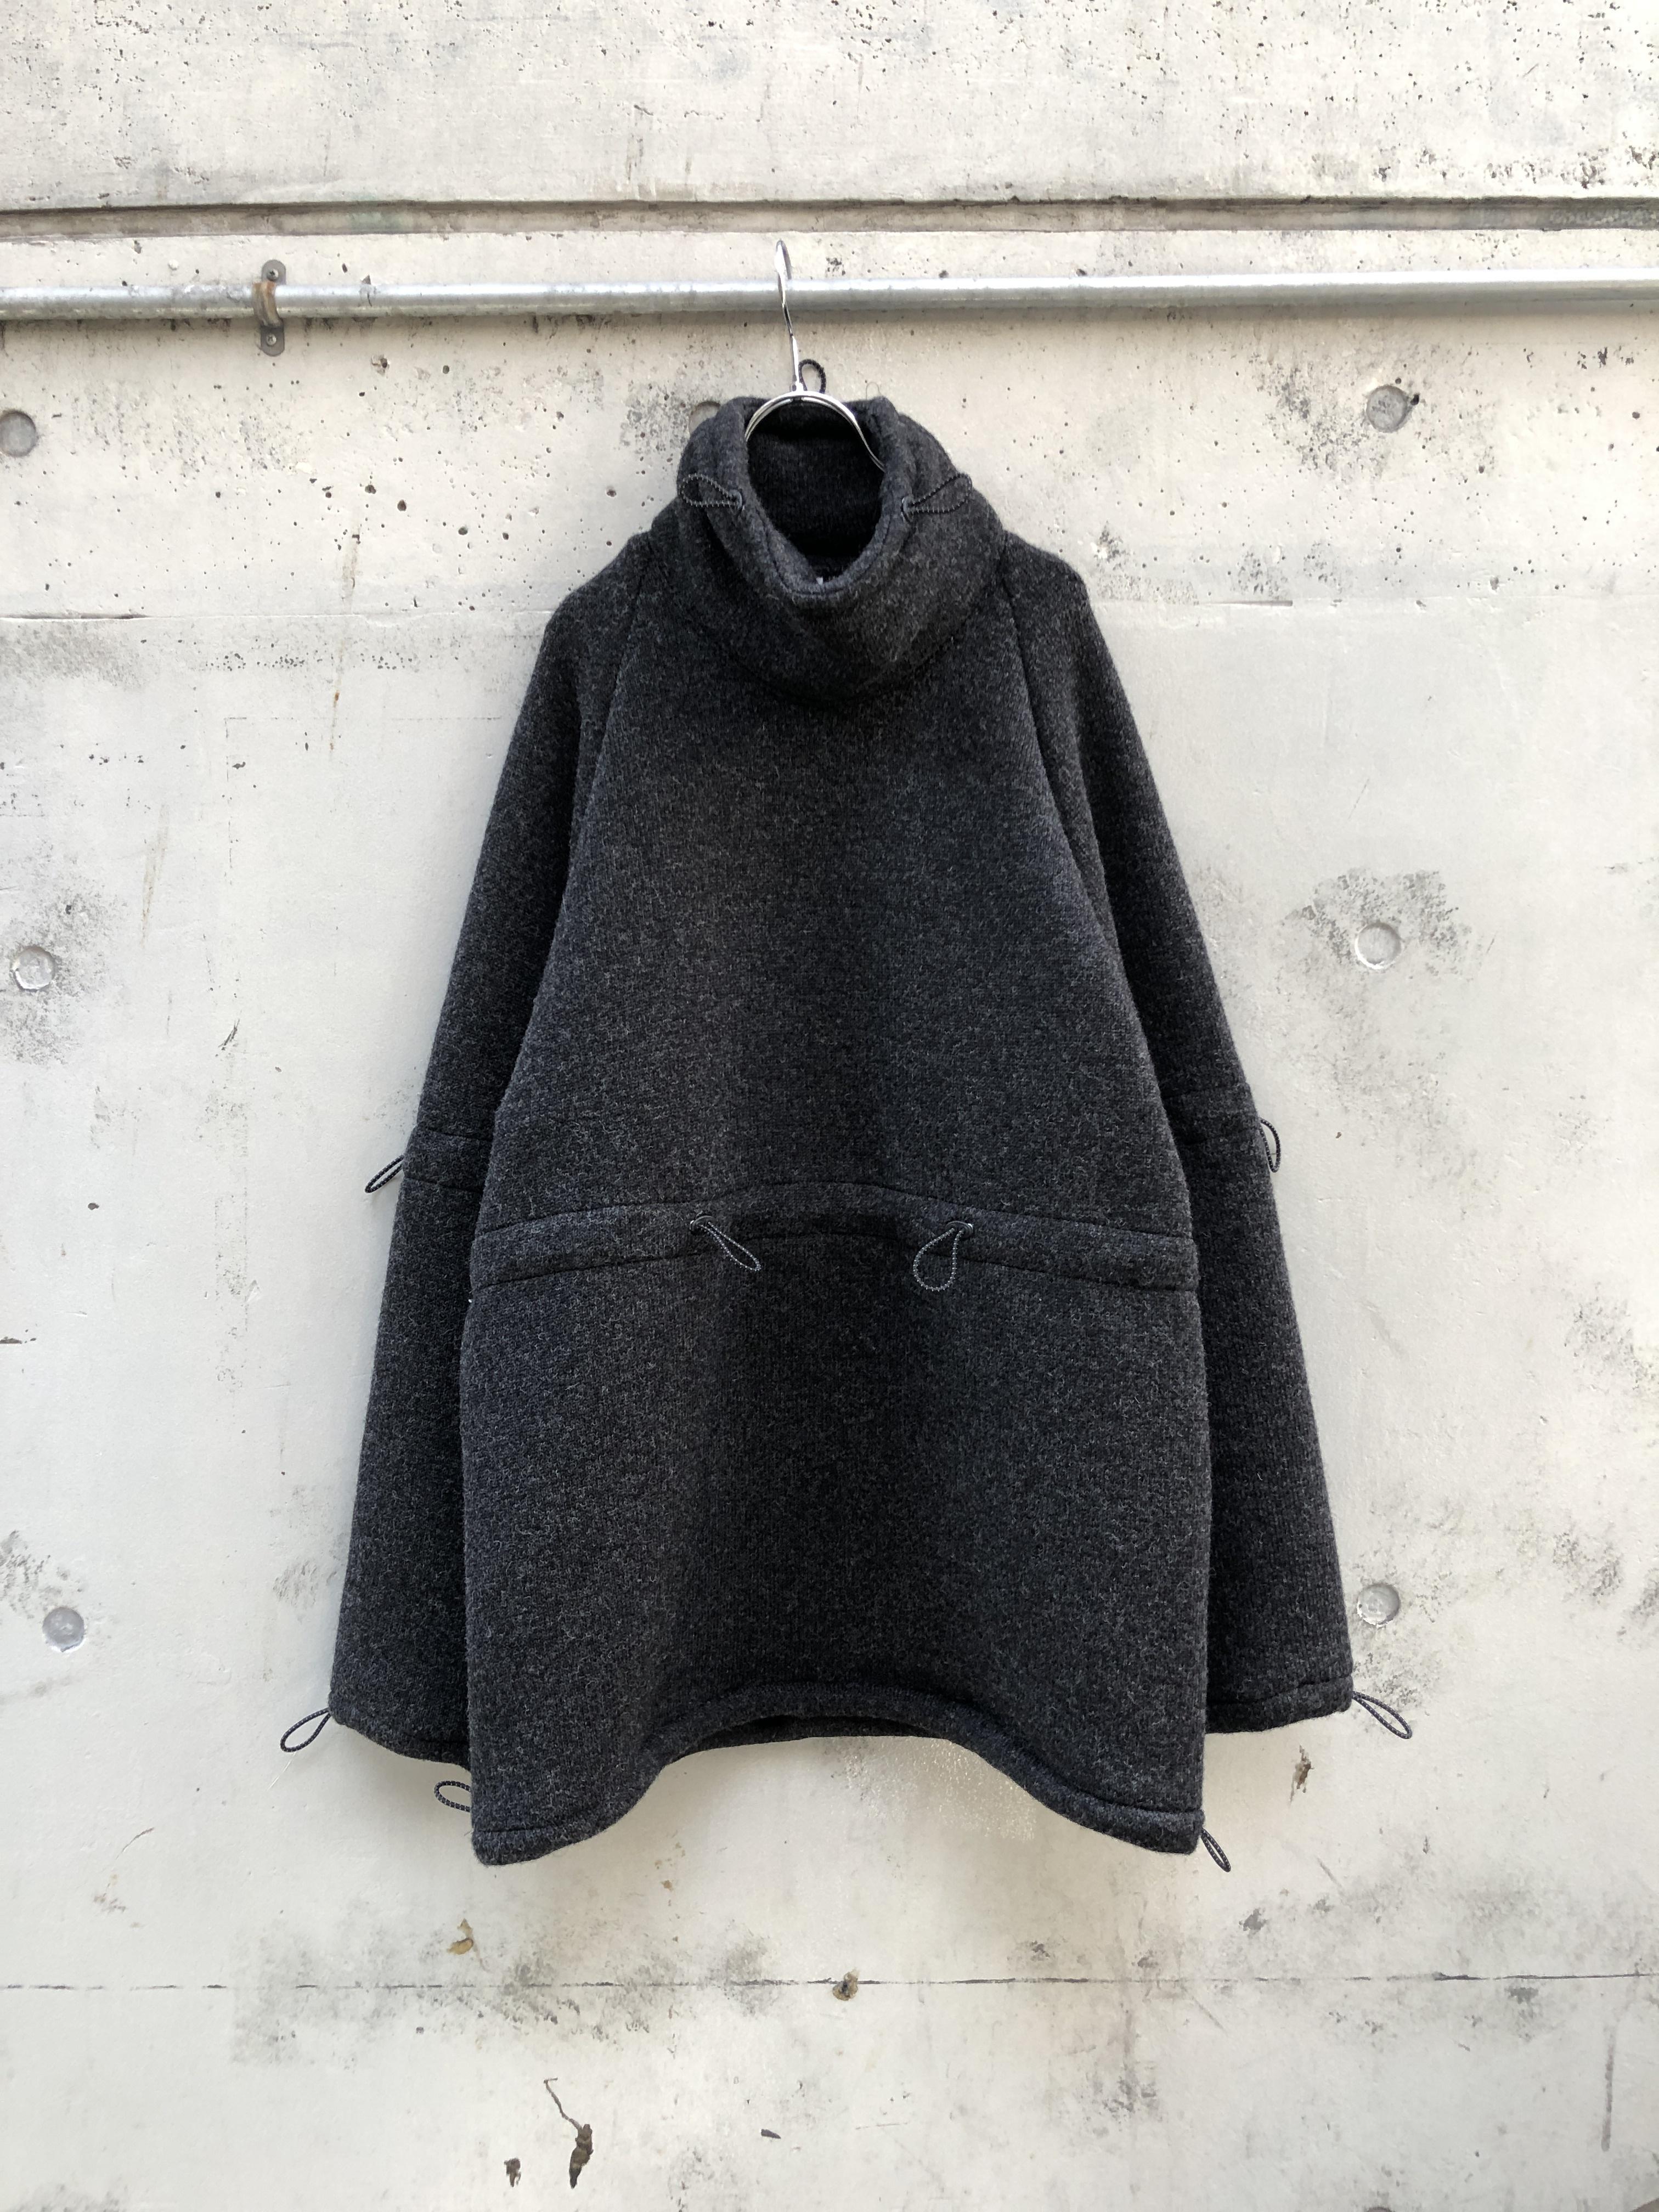 『RICE NINE TEN』adjustment hige neck wool jersey knit /  DARK GREY